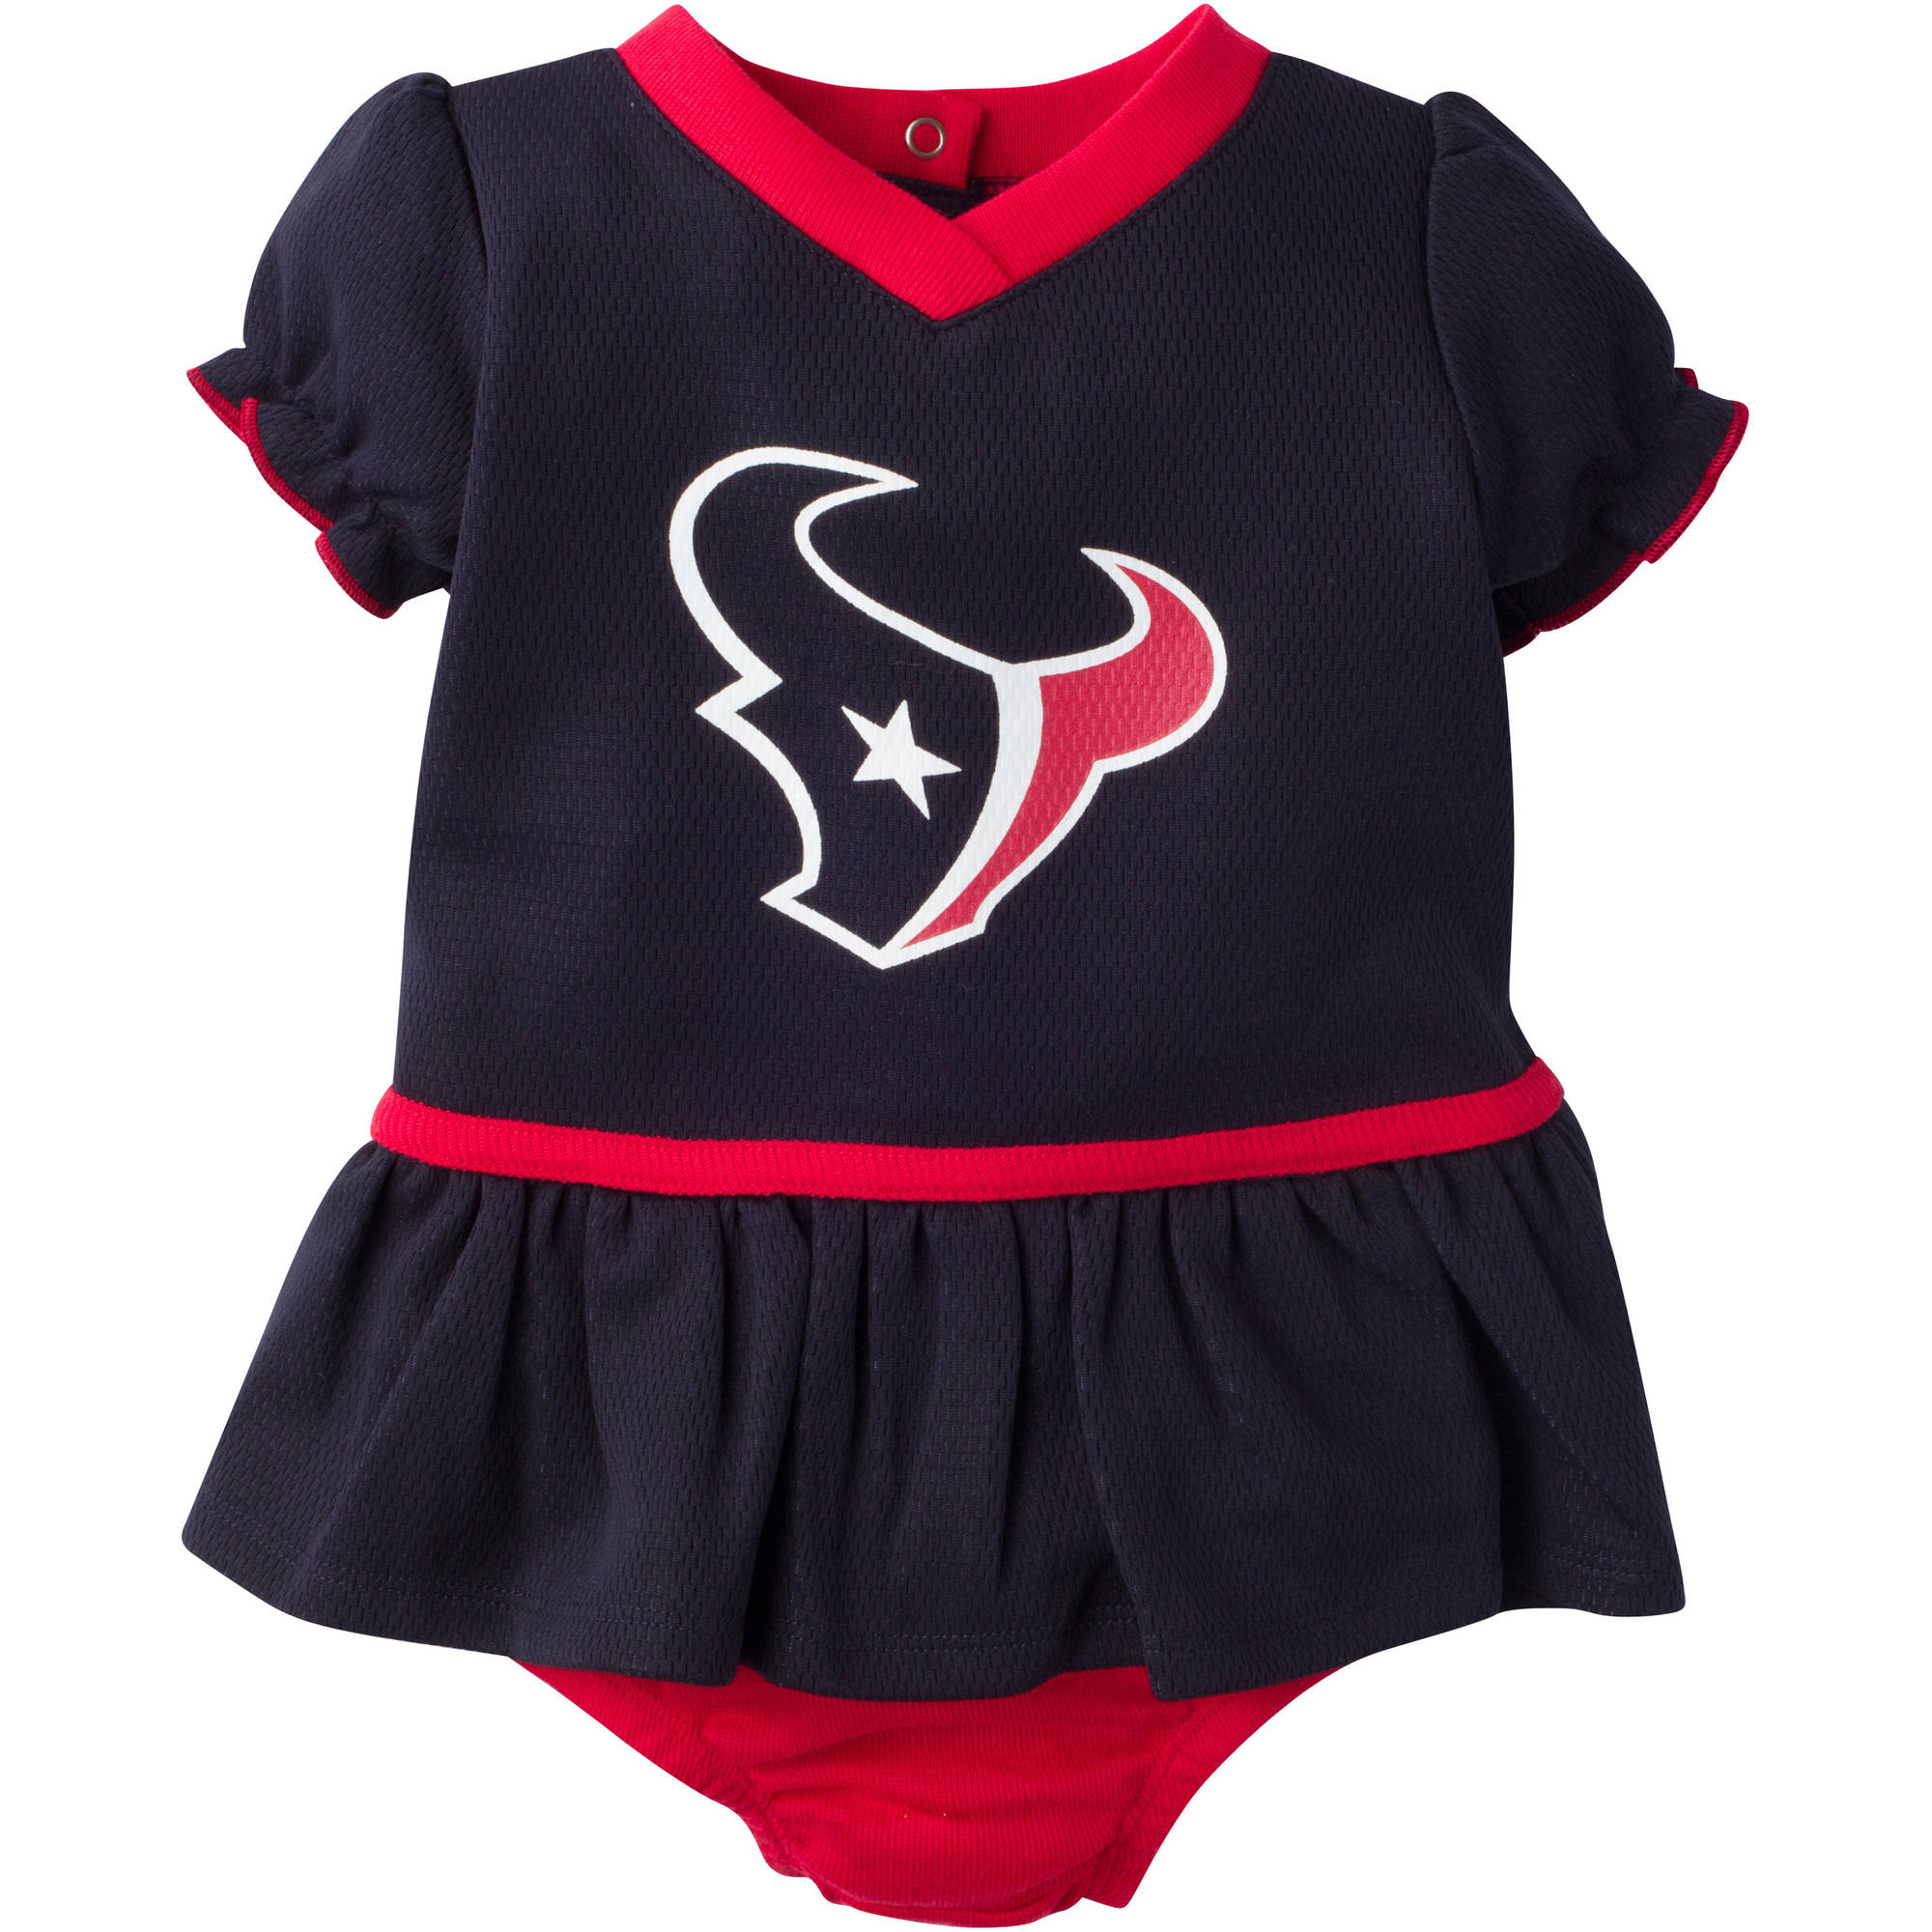 NFL Houston Texans Baby Girls Mesh Dazzle Dress and Panty Set, 2-Piece